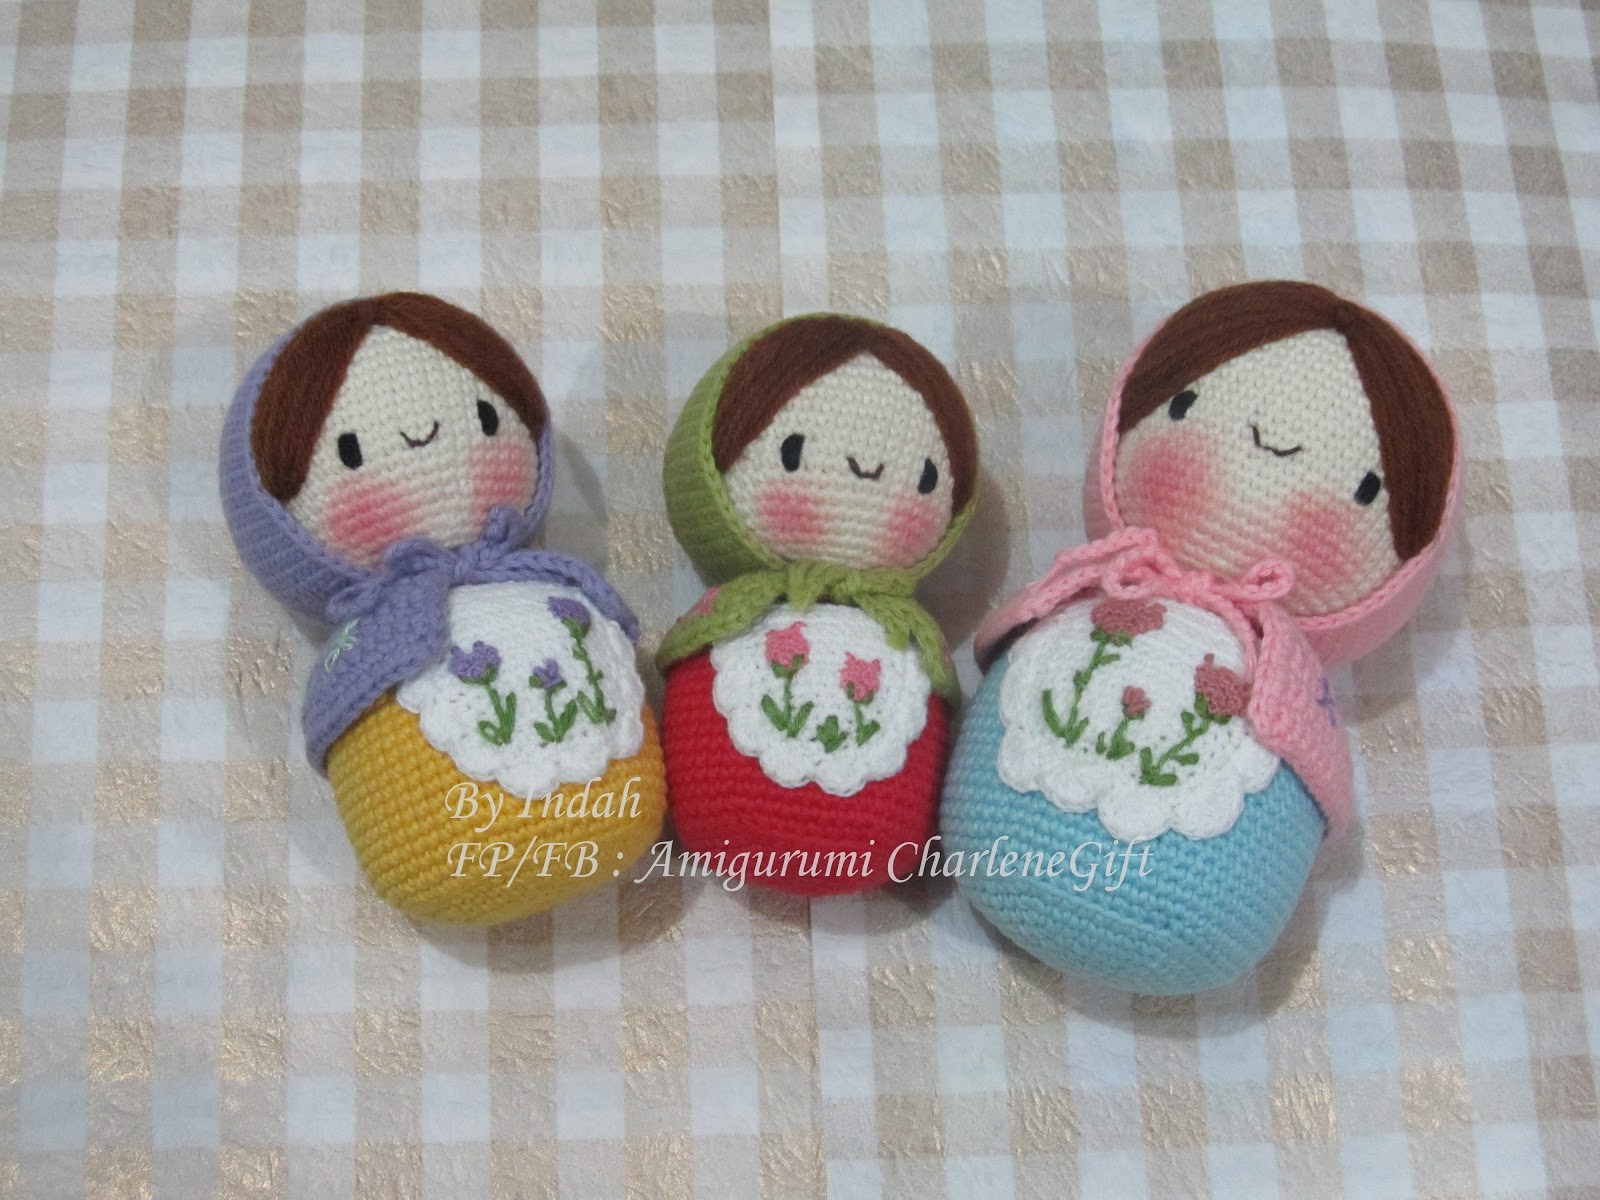 Amigurumi Boneka : Amigurumi charlene gift n craft matryoshka the most famous